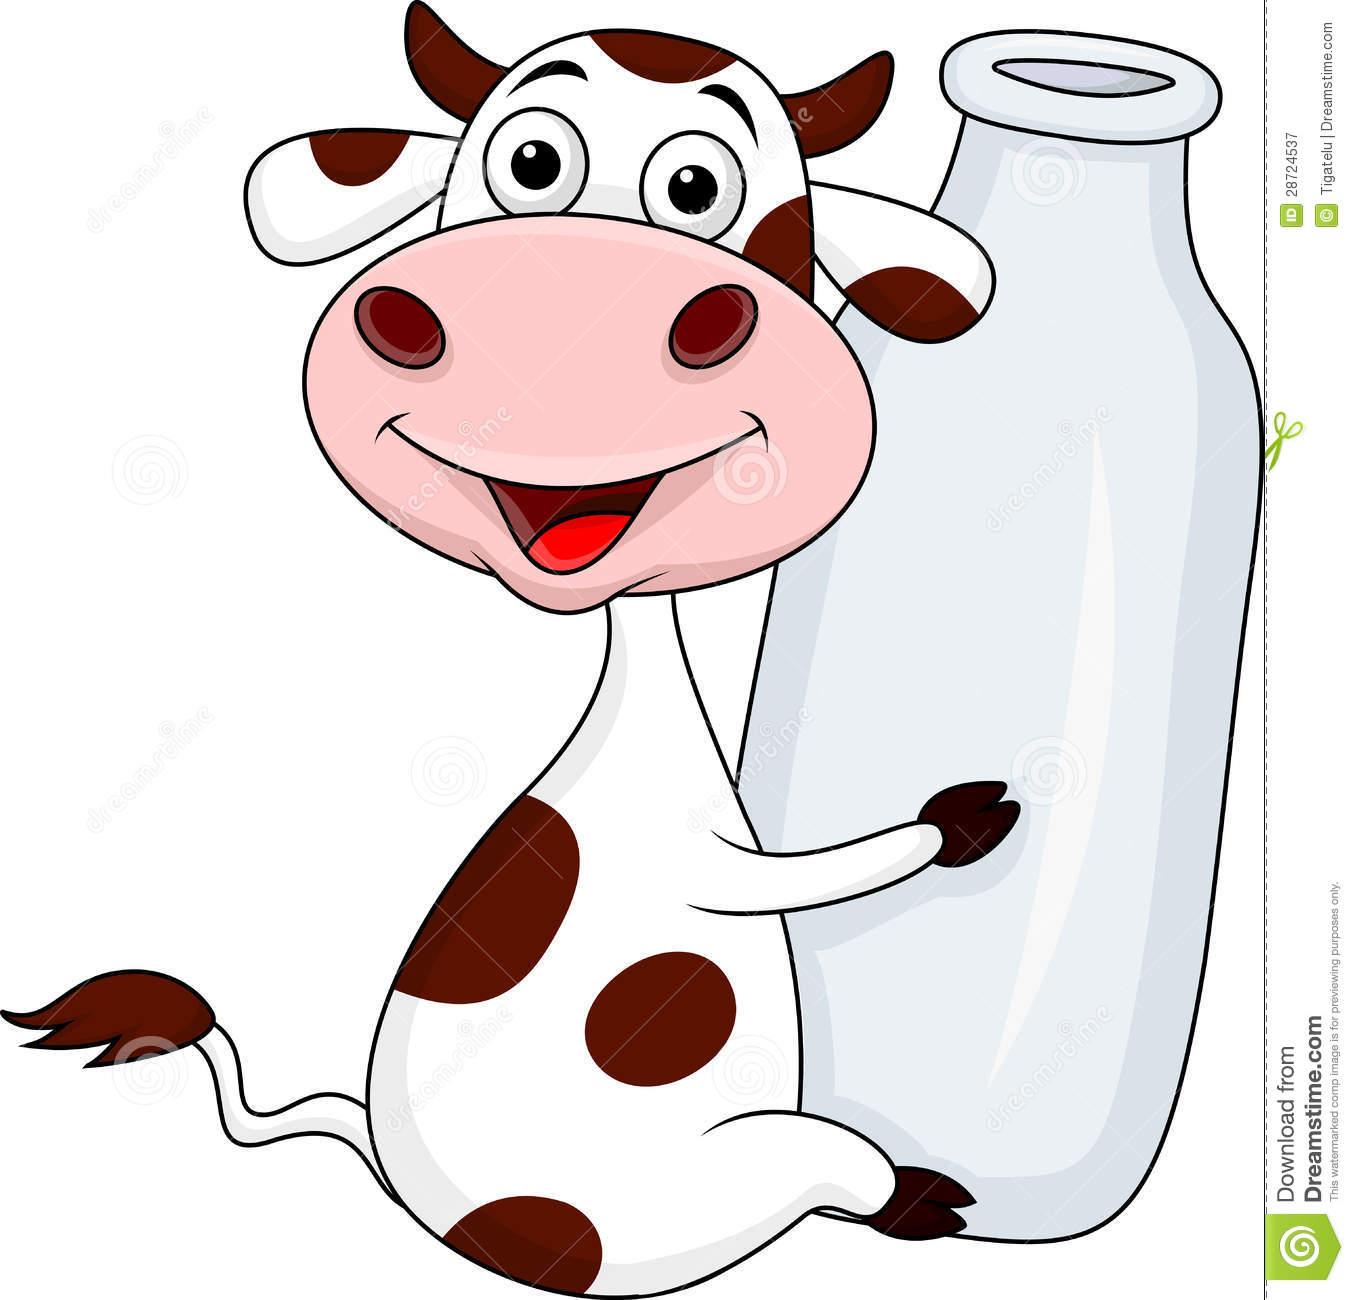 Milk cow clipart.